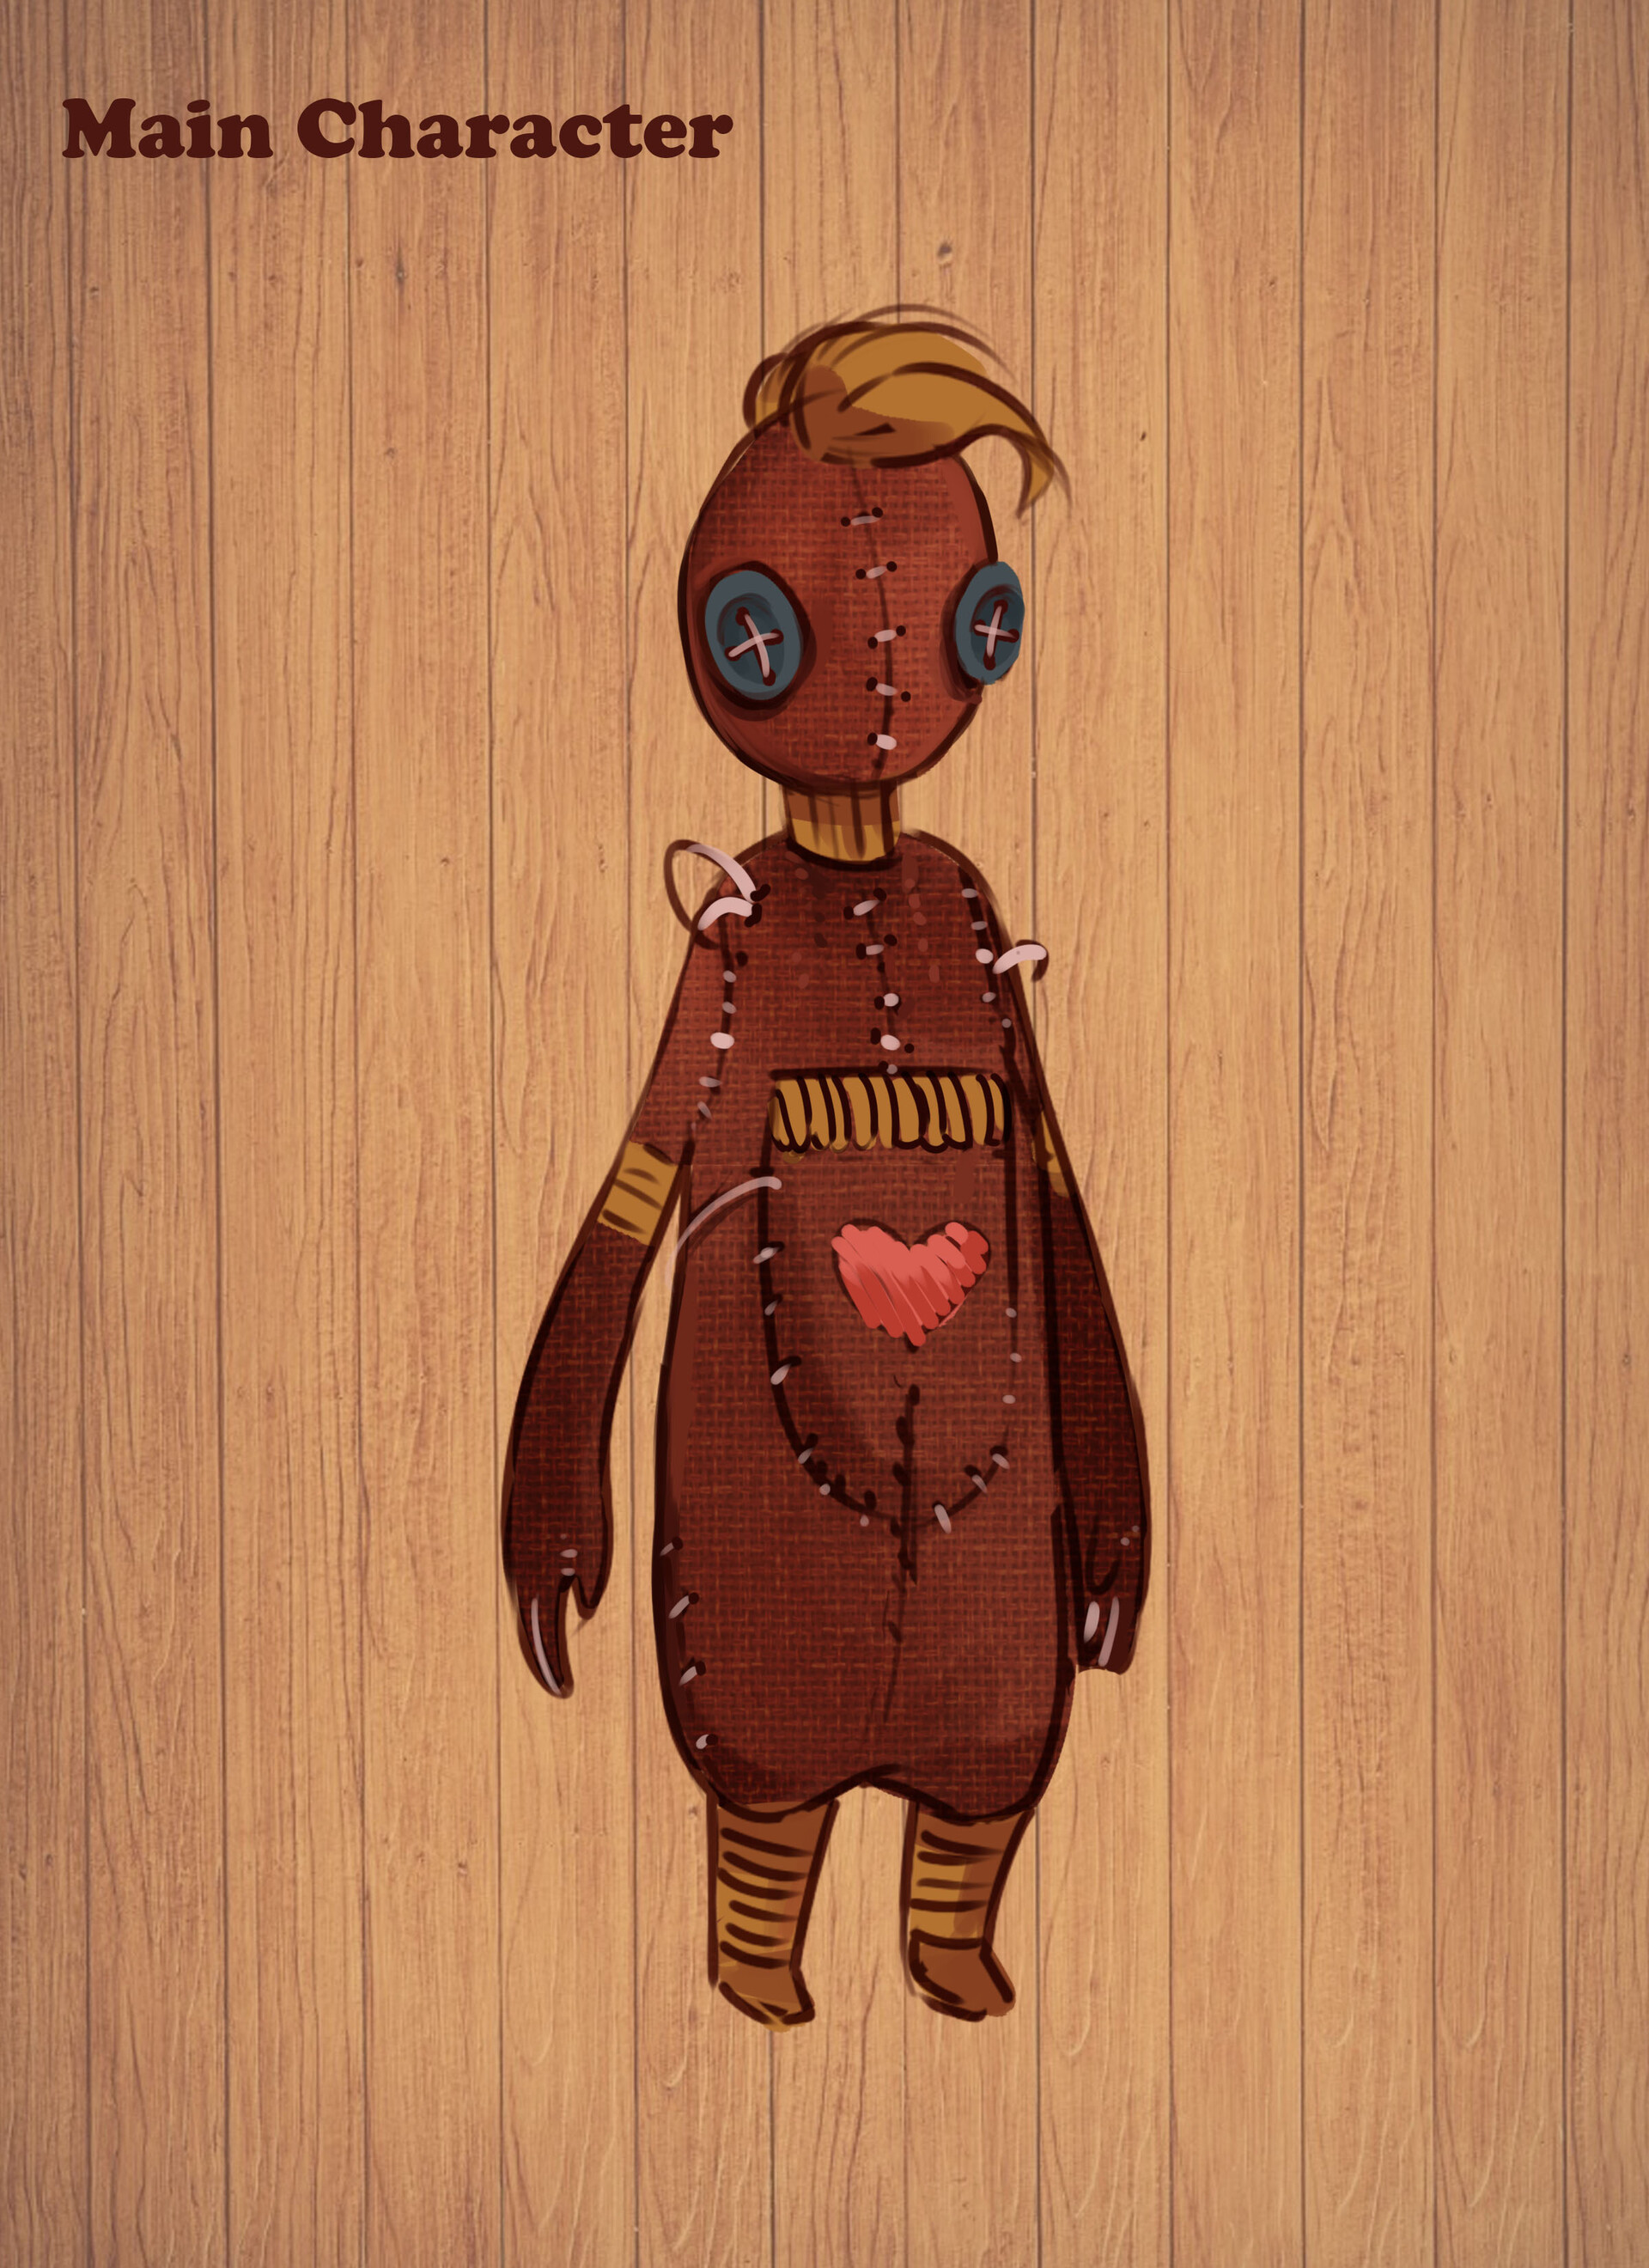 Main Character Concept Art by Tiffani Trogi